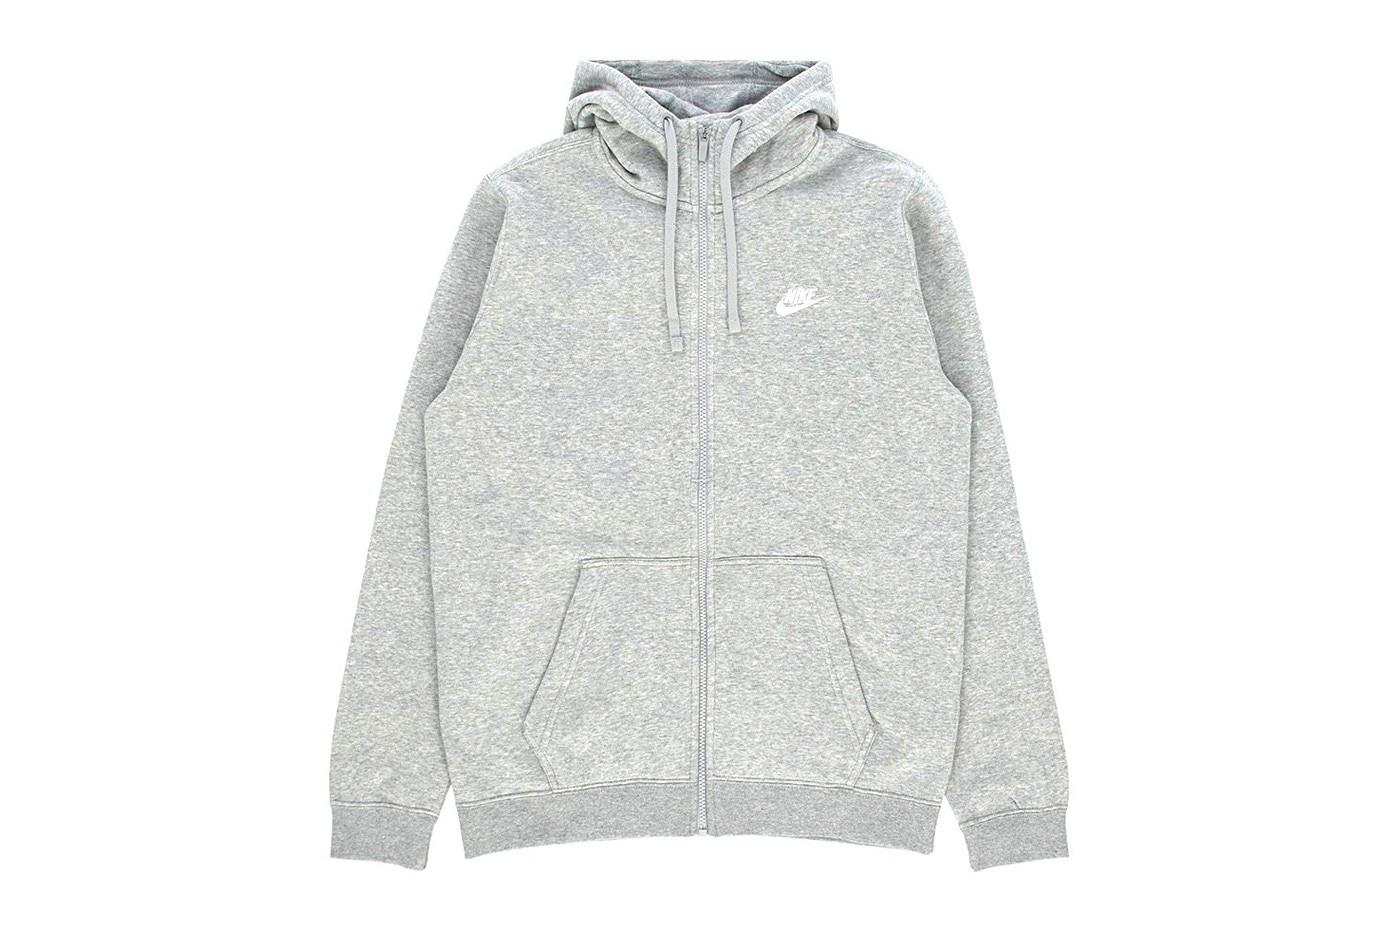 Nike x 1017 ALYX 9SM hoodie